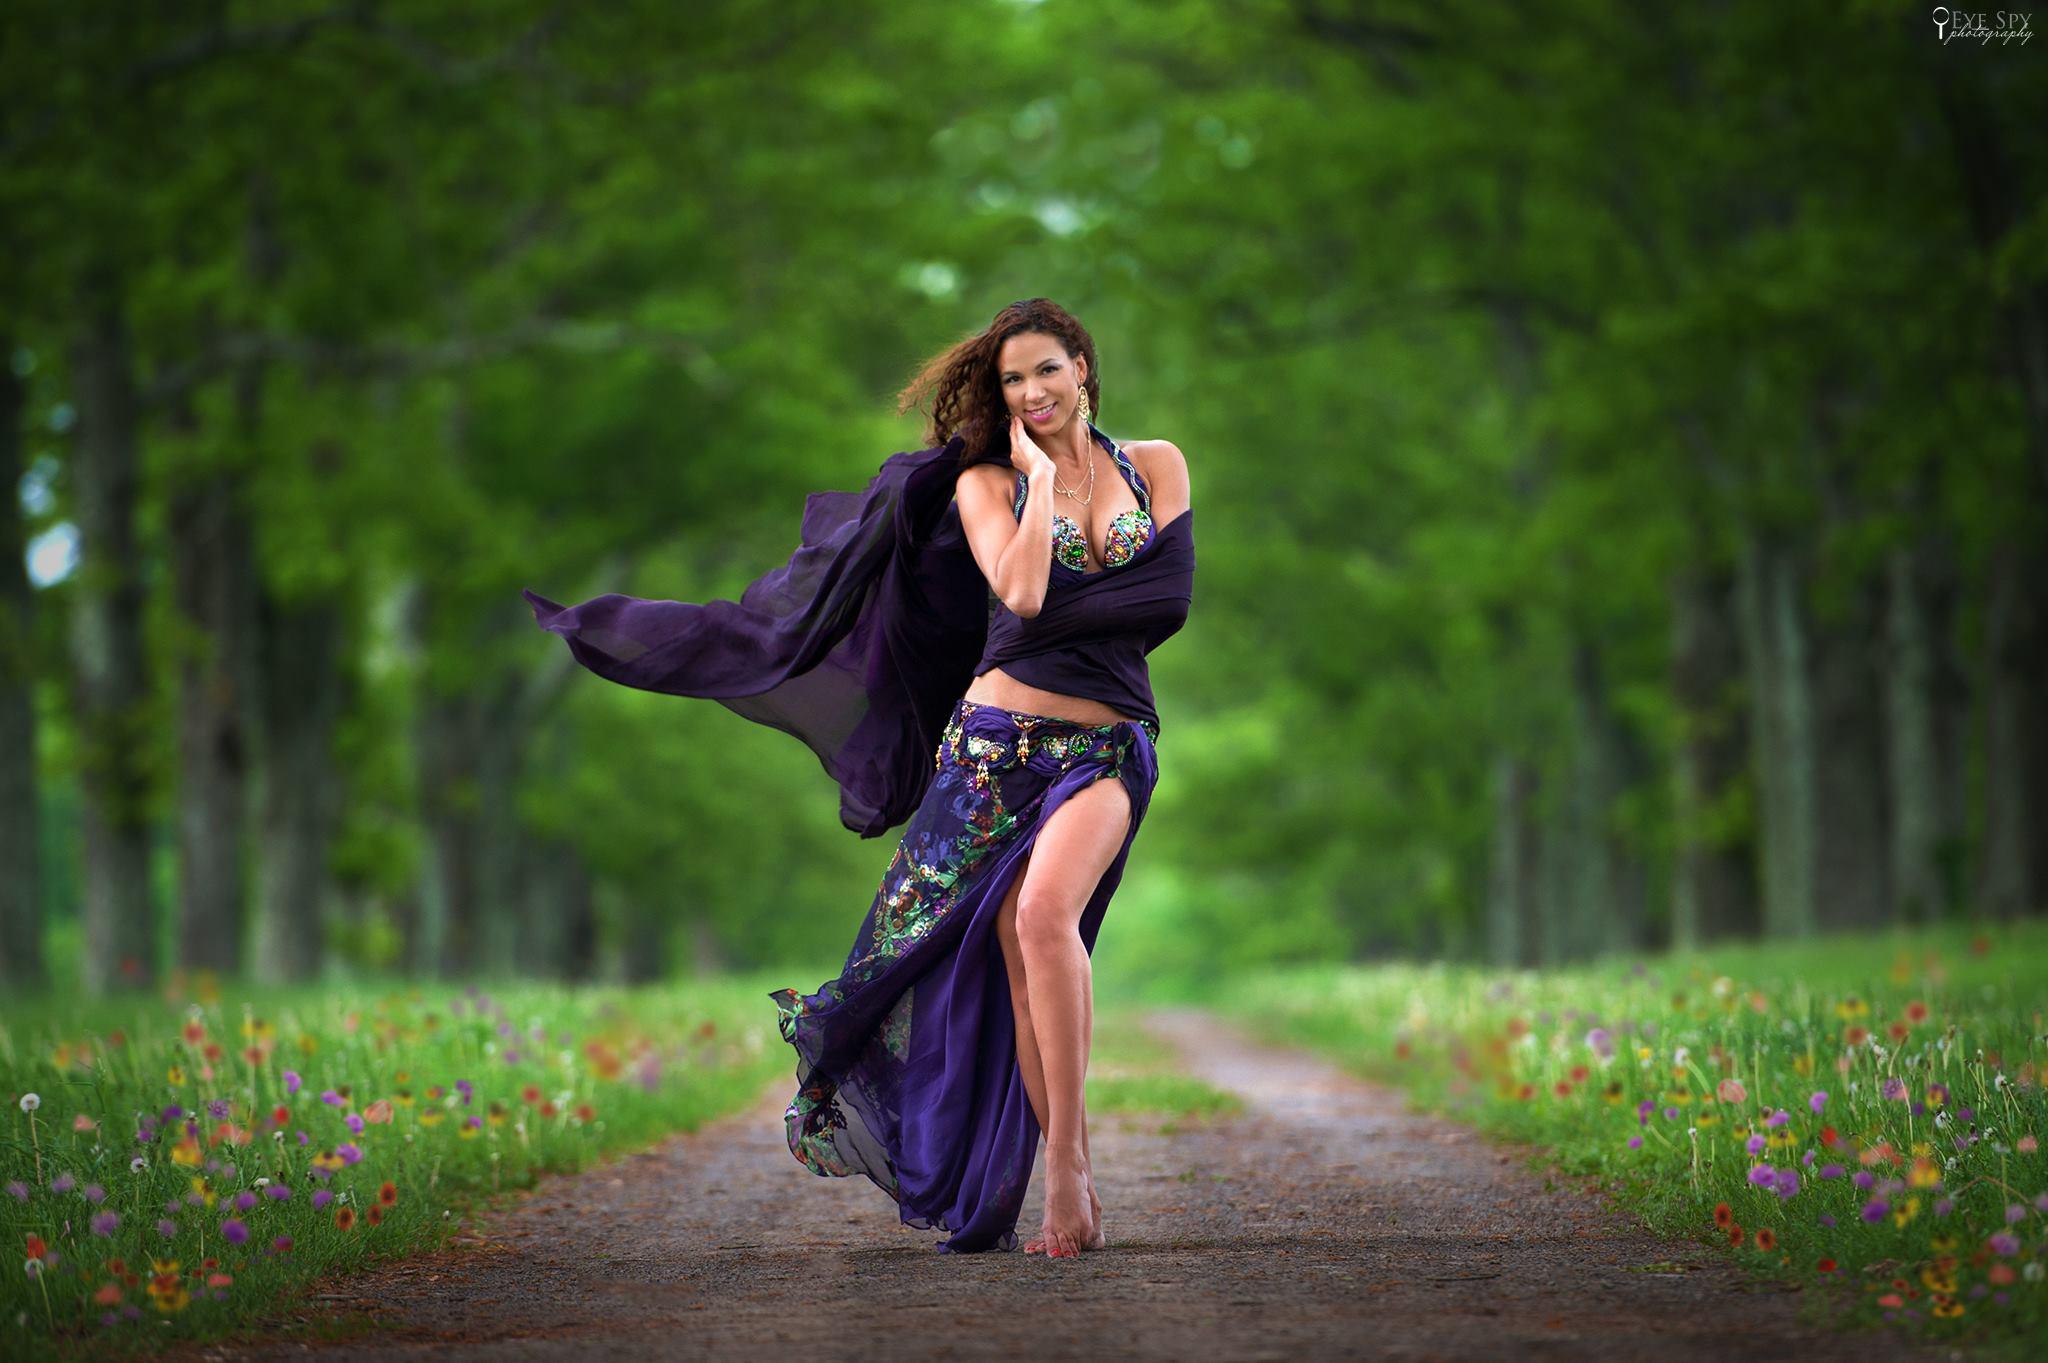 Angie Purple Web